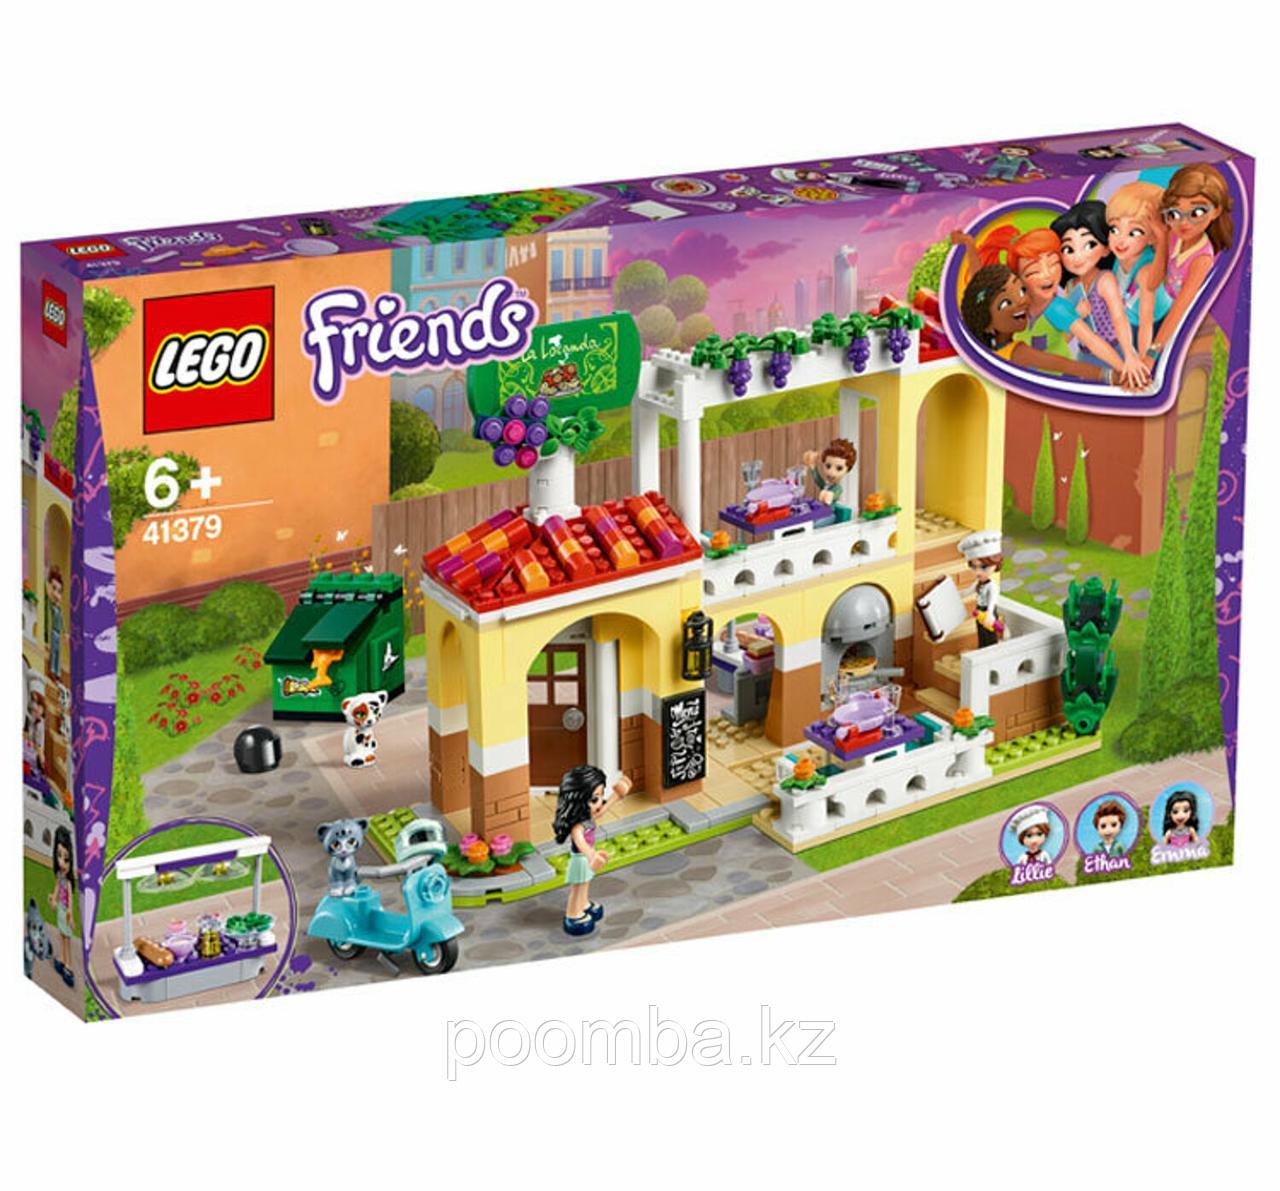 Конструктор Lego Friends Ресторан Хартлейк Сити, Лего Подружки